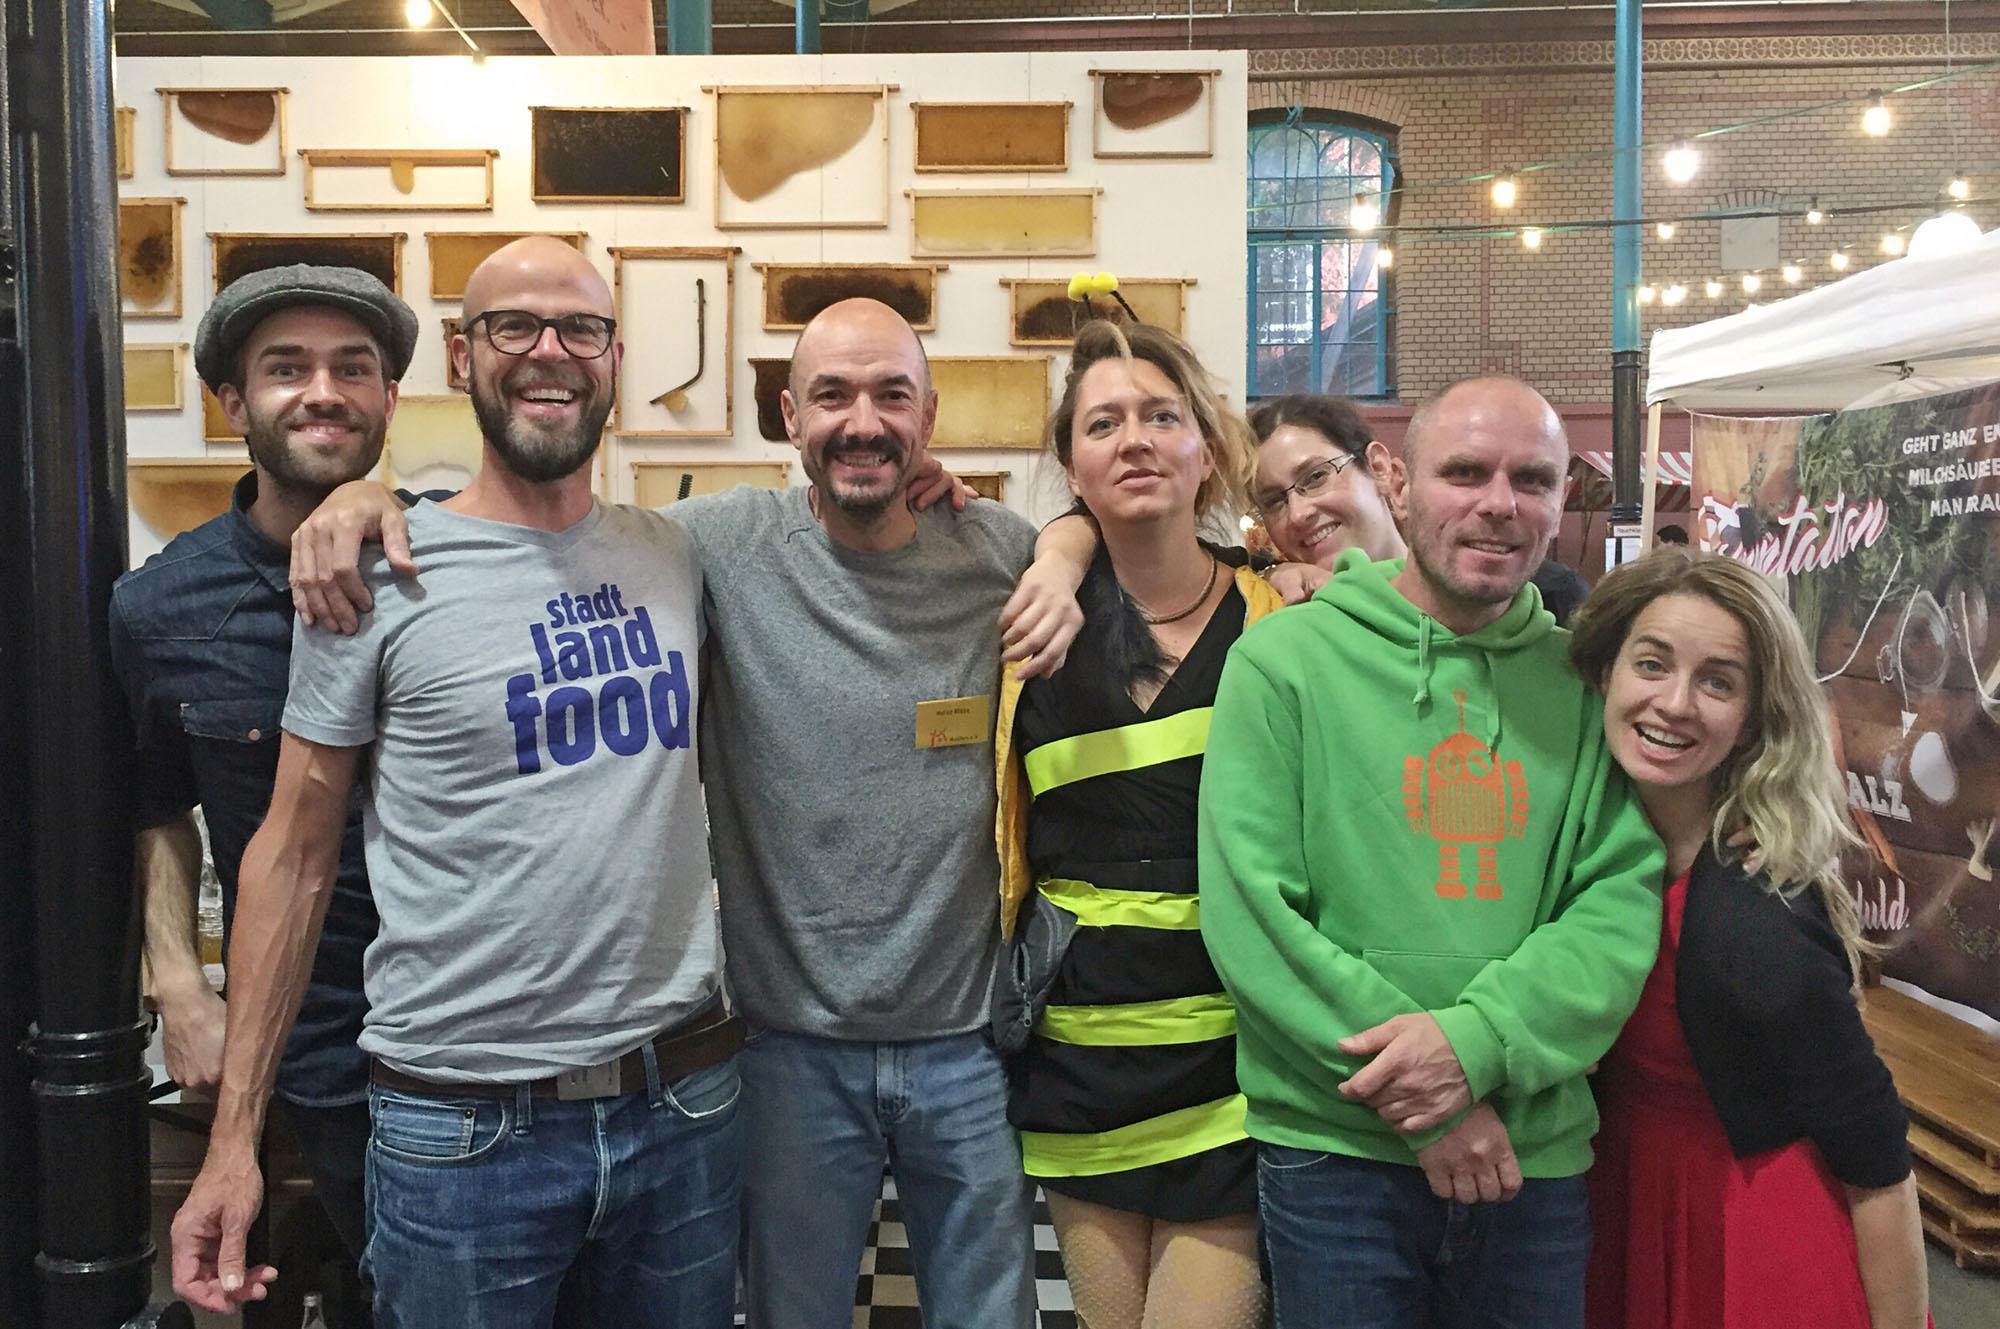 StadtLandFood 2016 Mellifera Berlin Team